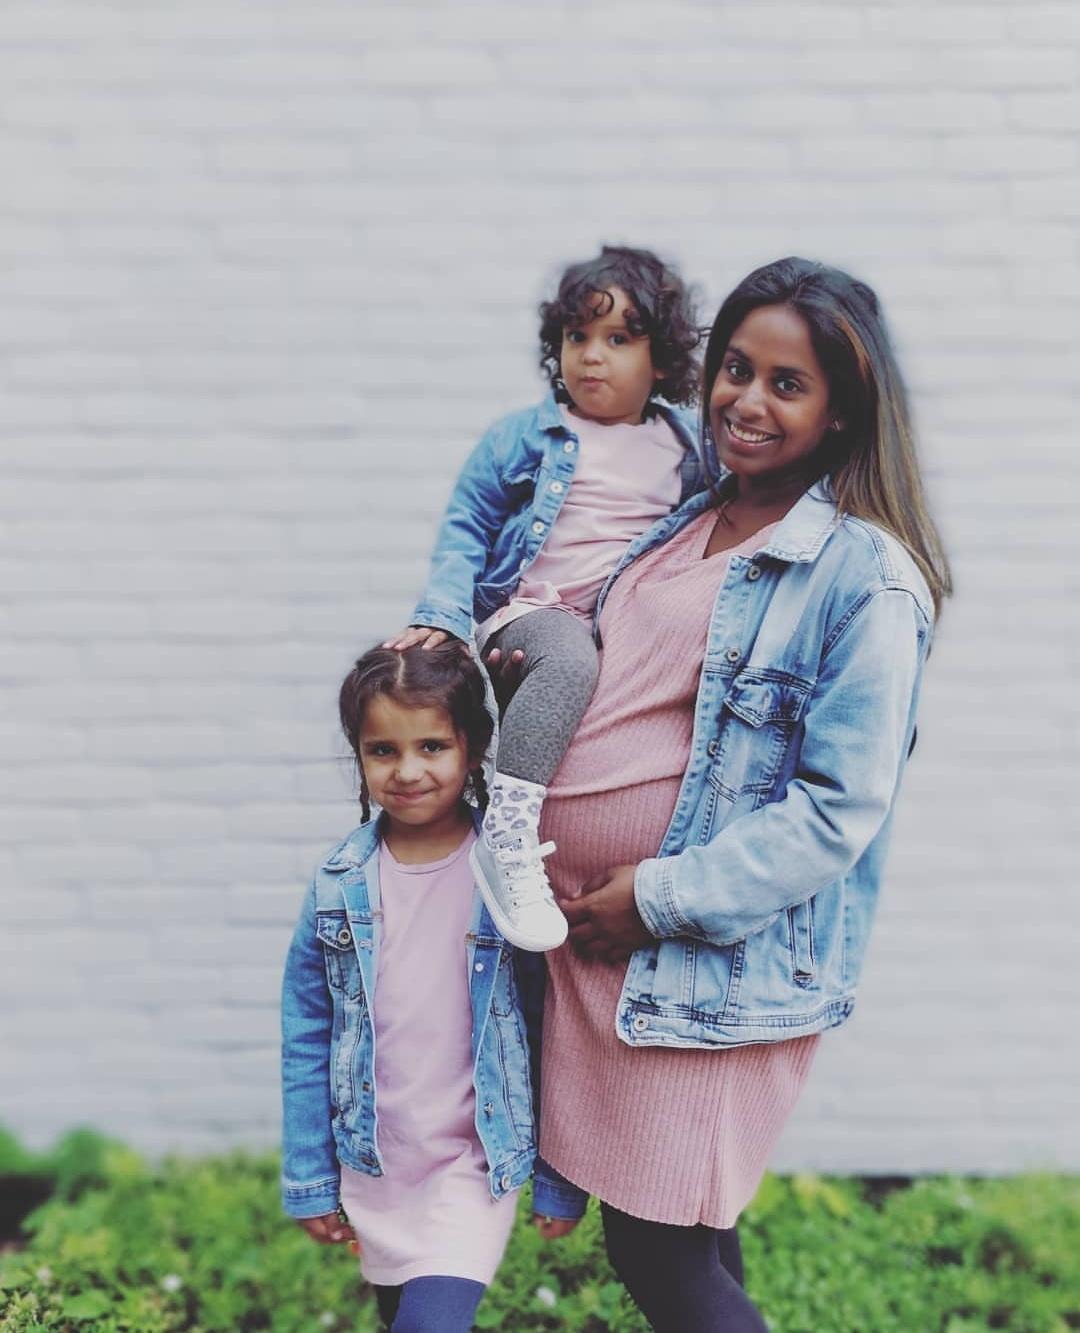 connectie kind prenatale depressie